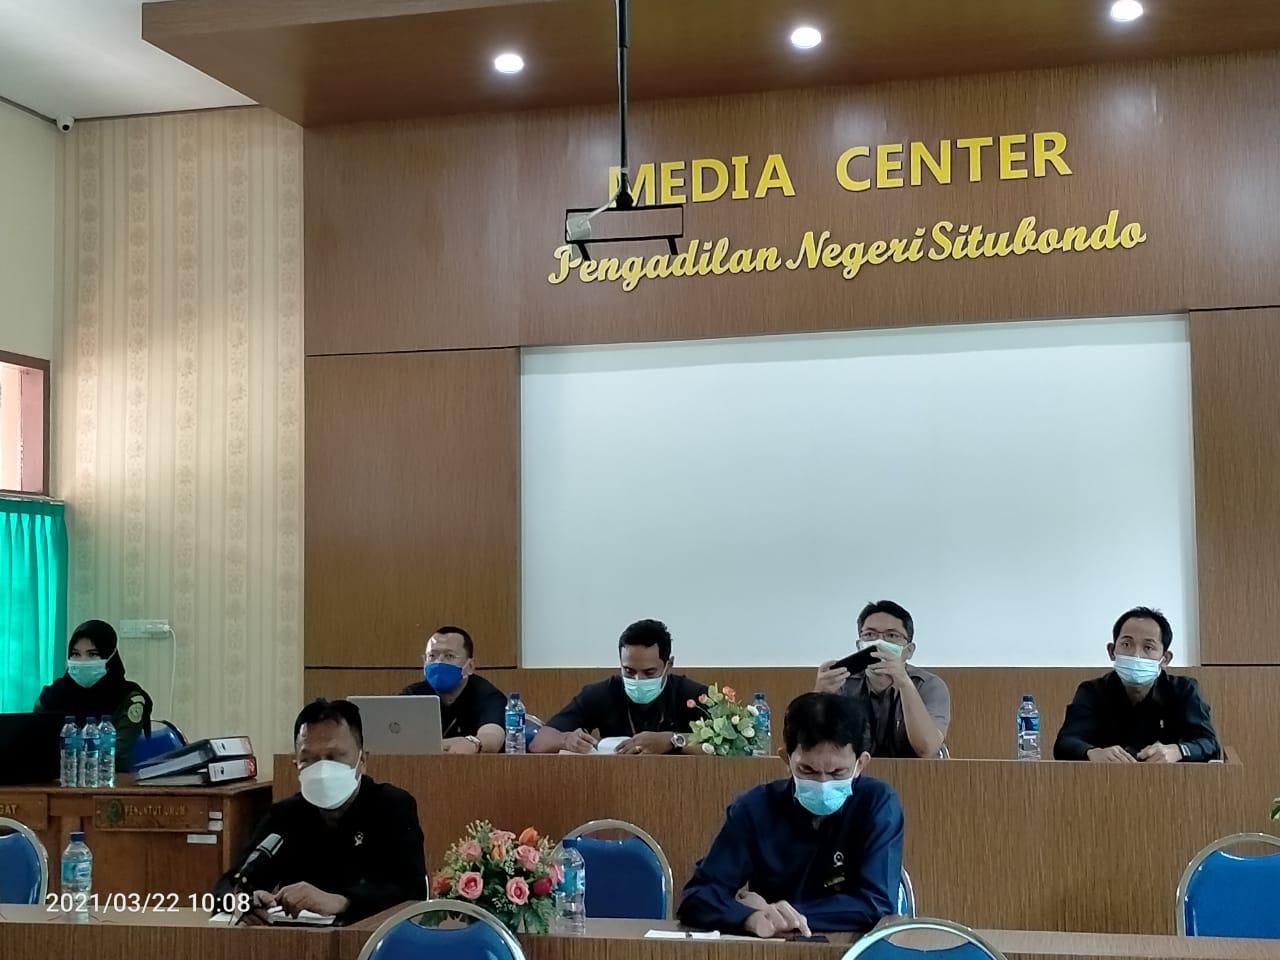 Penilaian Desk Evaluasi atas Pelaksanaan Zona Integritas Pengadilan Negeri Situbondo Menuju WBK dan WBBM 2021